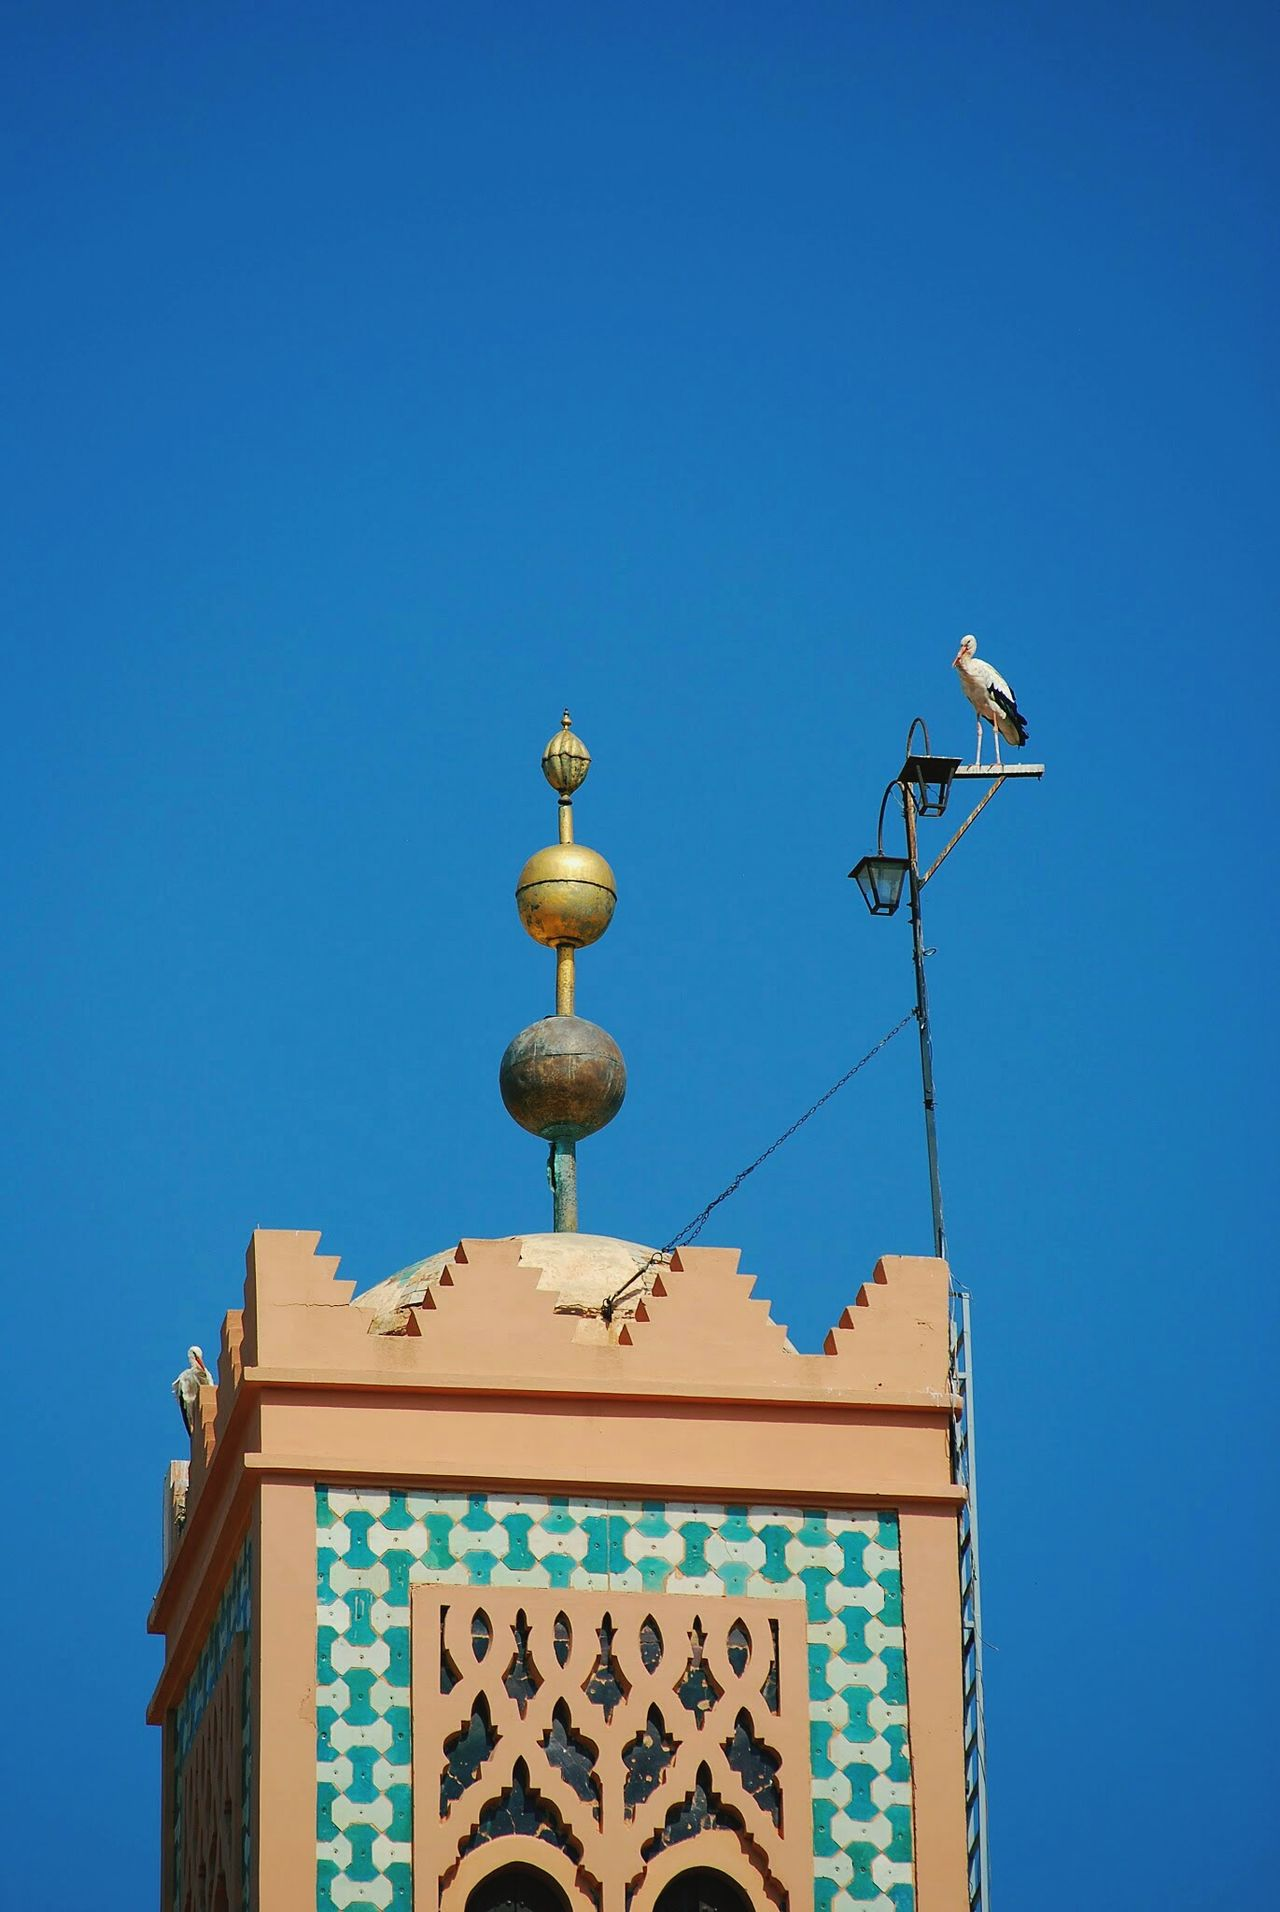 Sky City Tower Bird Summer Minimalism Holidays Marrakech